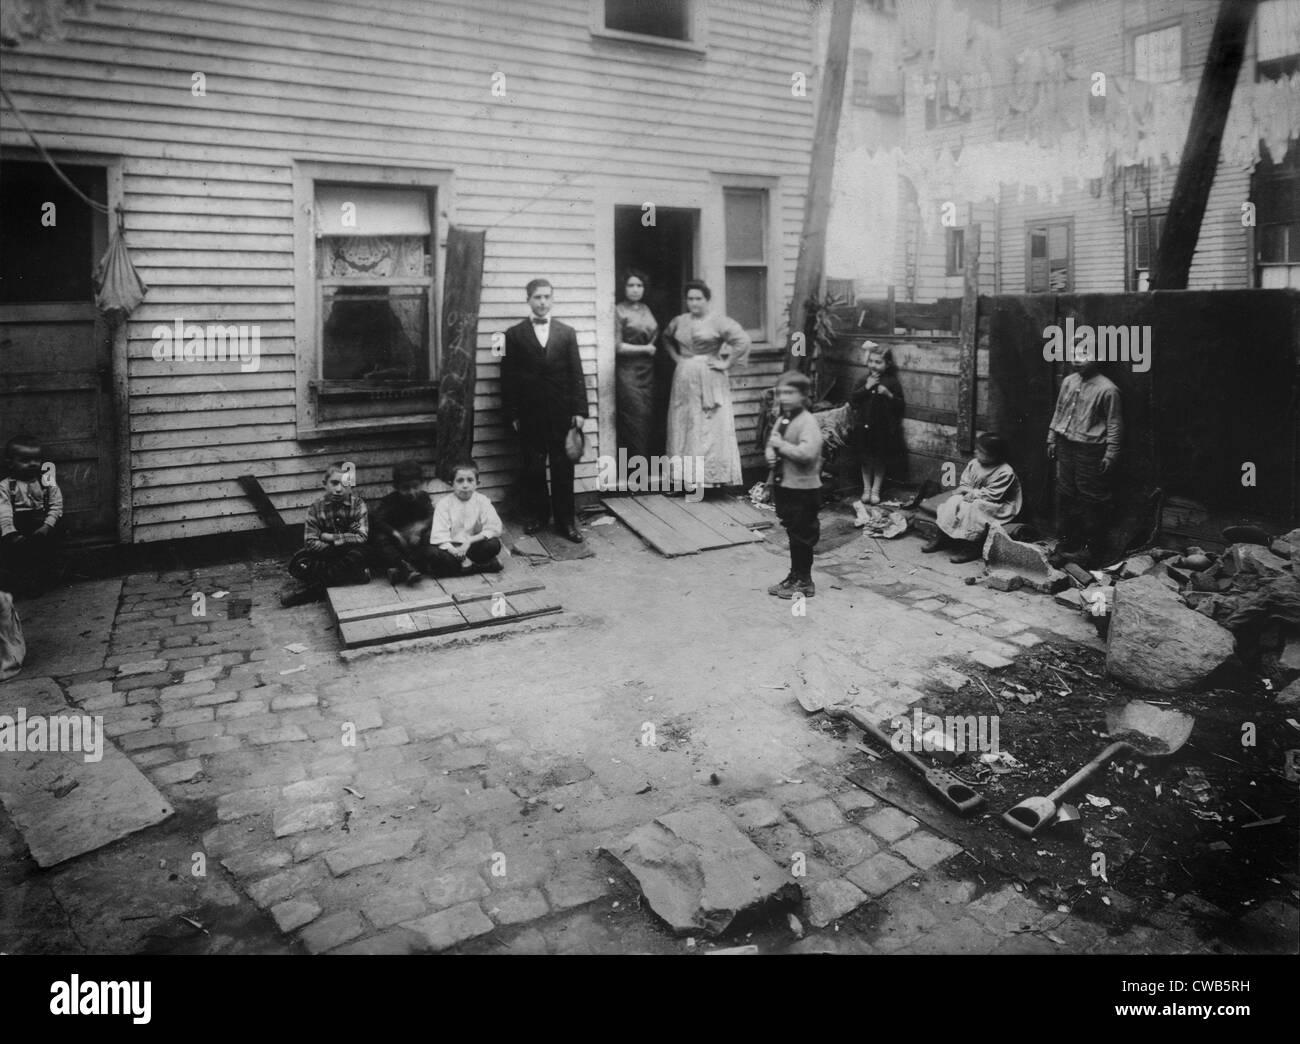 November 1912 Stock Photos & November 1912 Stock Images - Alamy